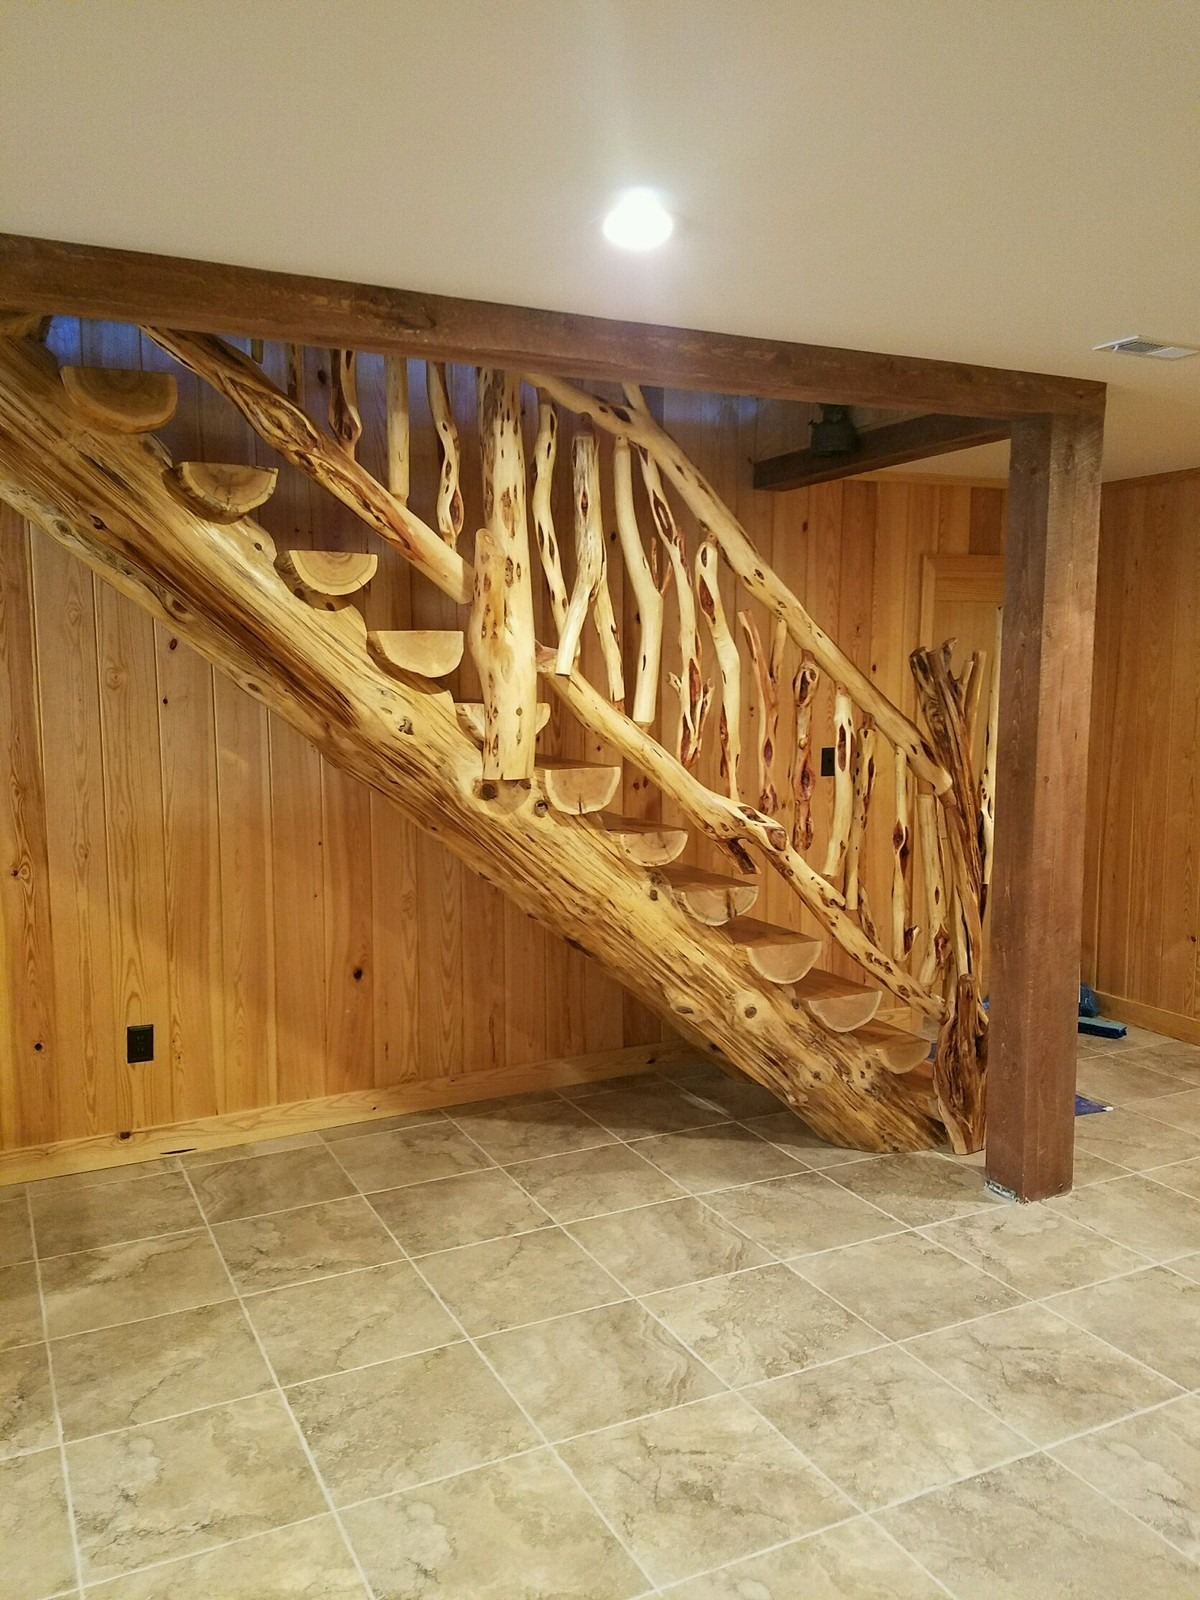 Diamond Willow Stairway - Ryan's Rustic Railings